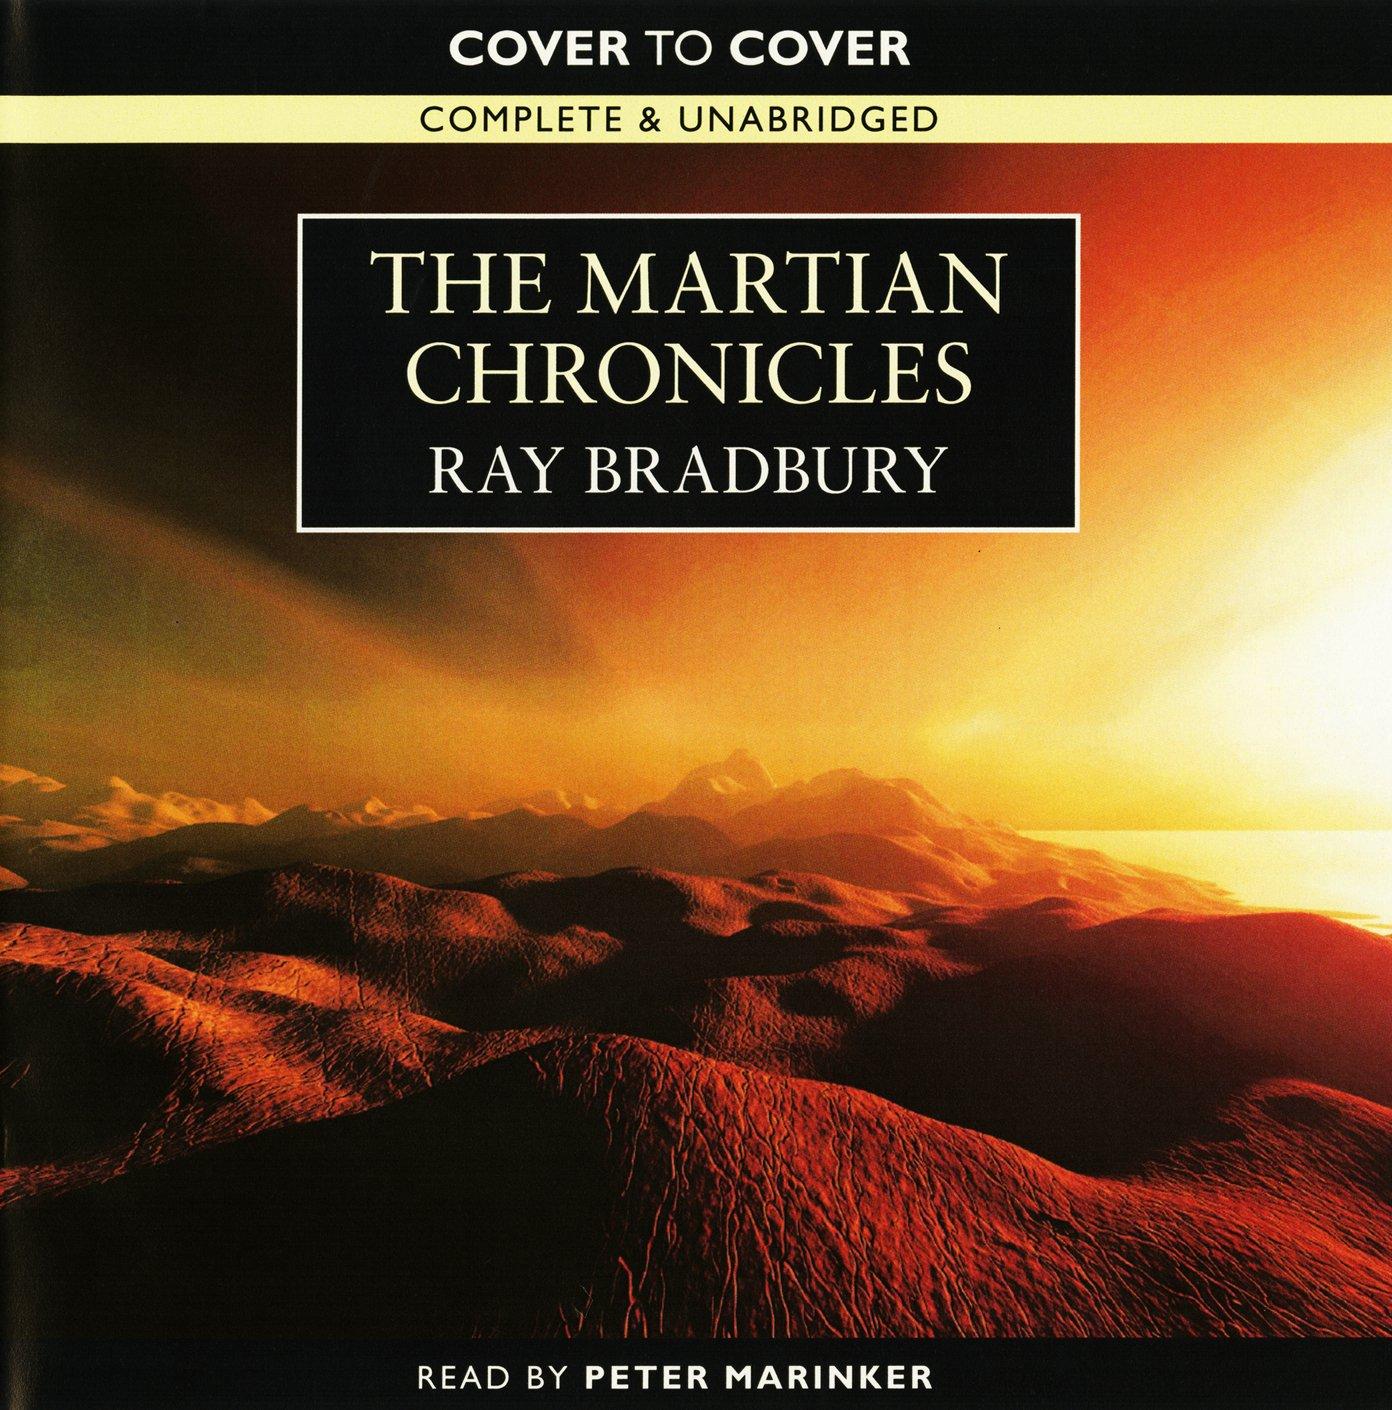 The Martian Chronicles [Complete & Unabridged Audiobook]: 9781408443385:  Amazon.com: Books